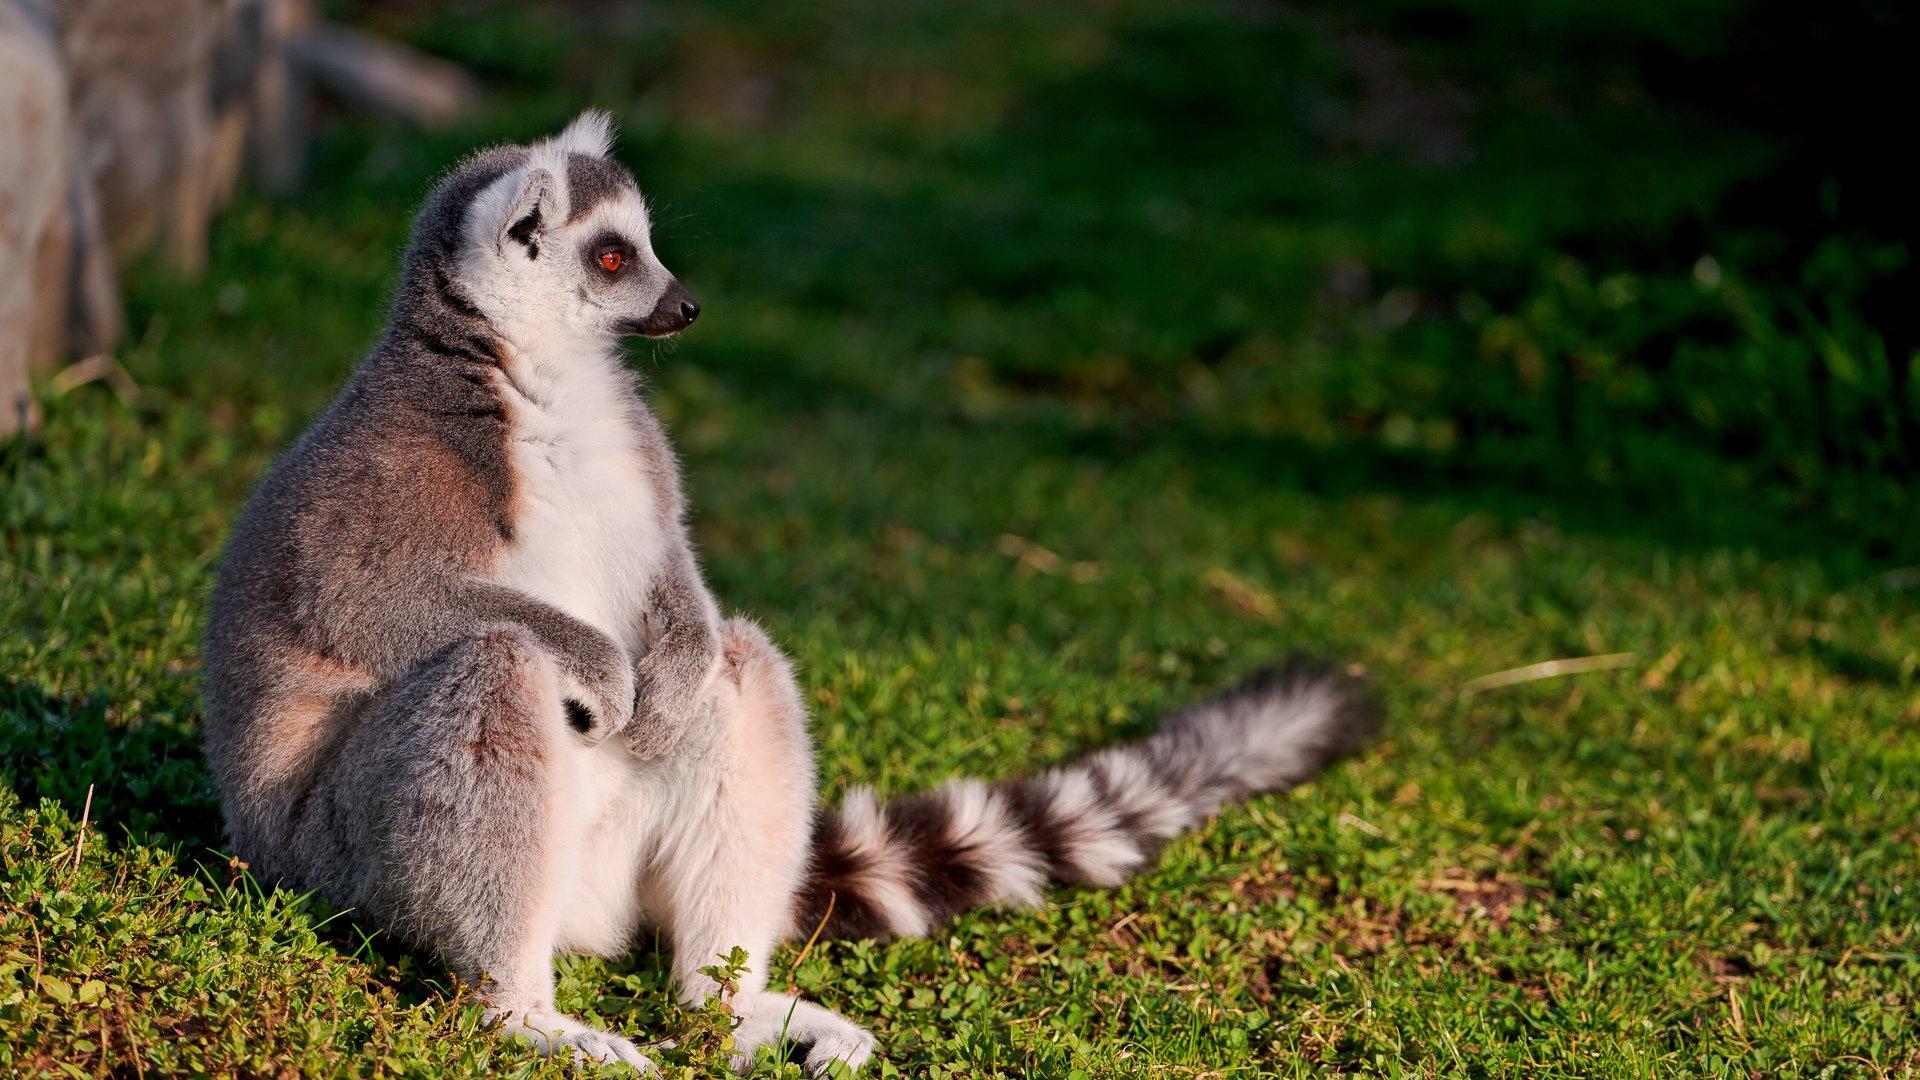 Lemur pc wallpaper